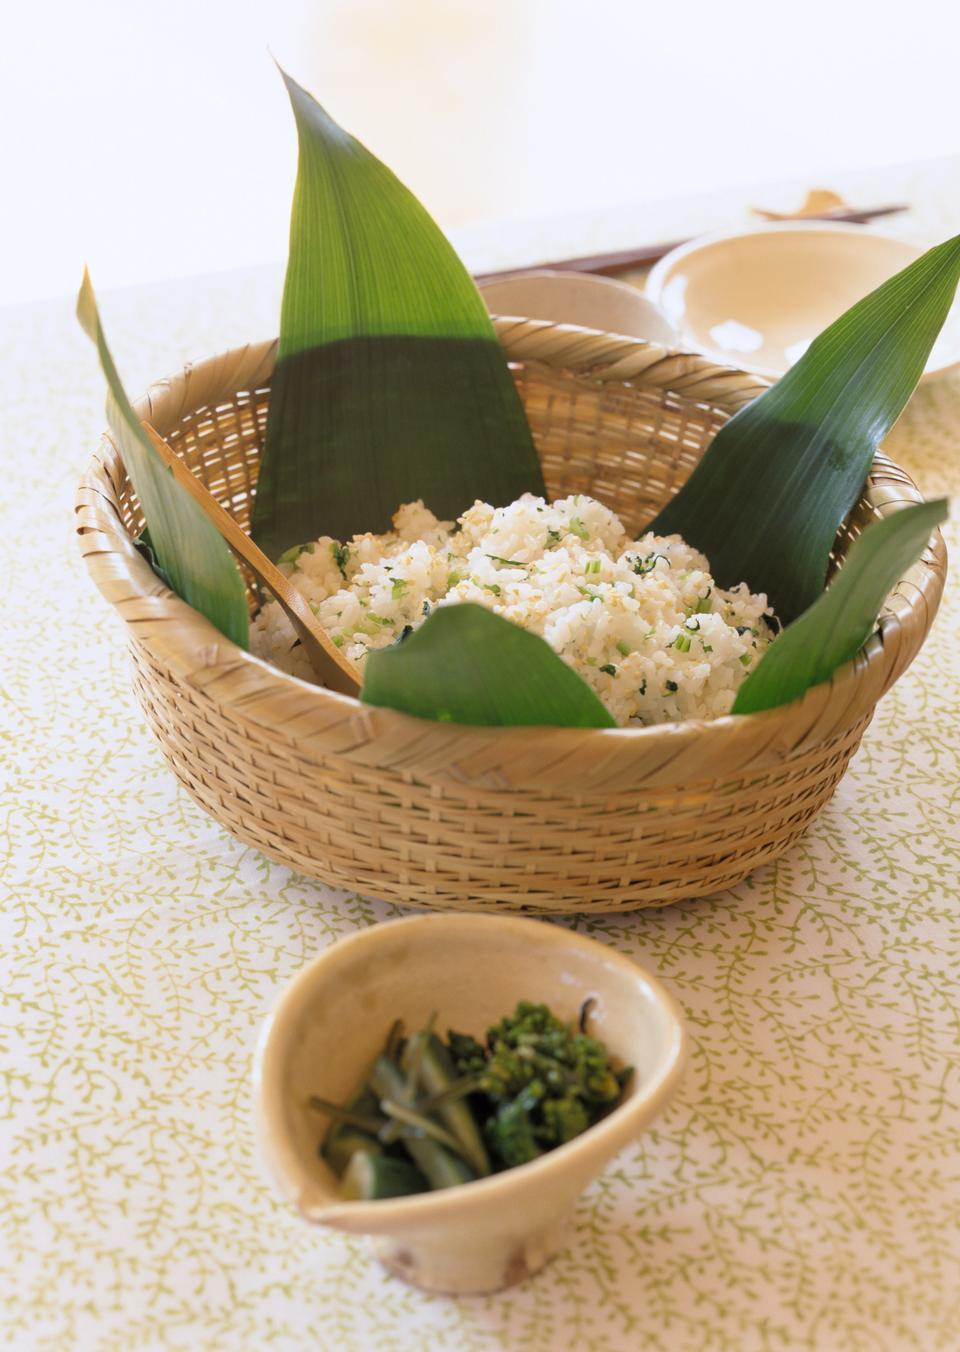 Japanese food, shiso herbal and sesame rice